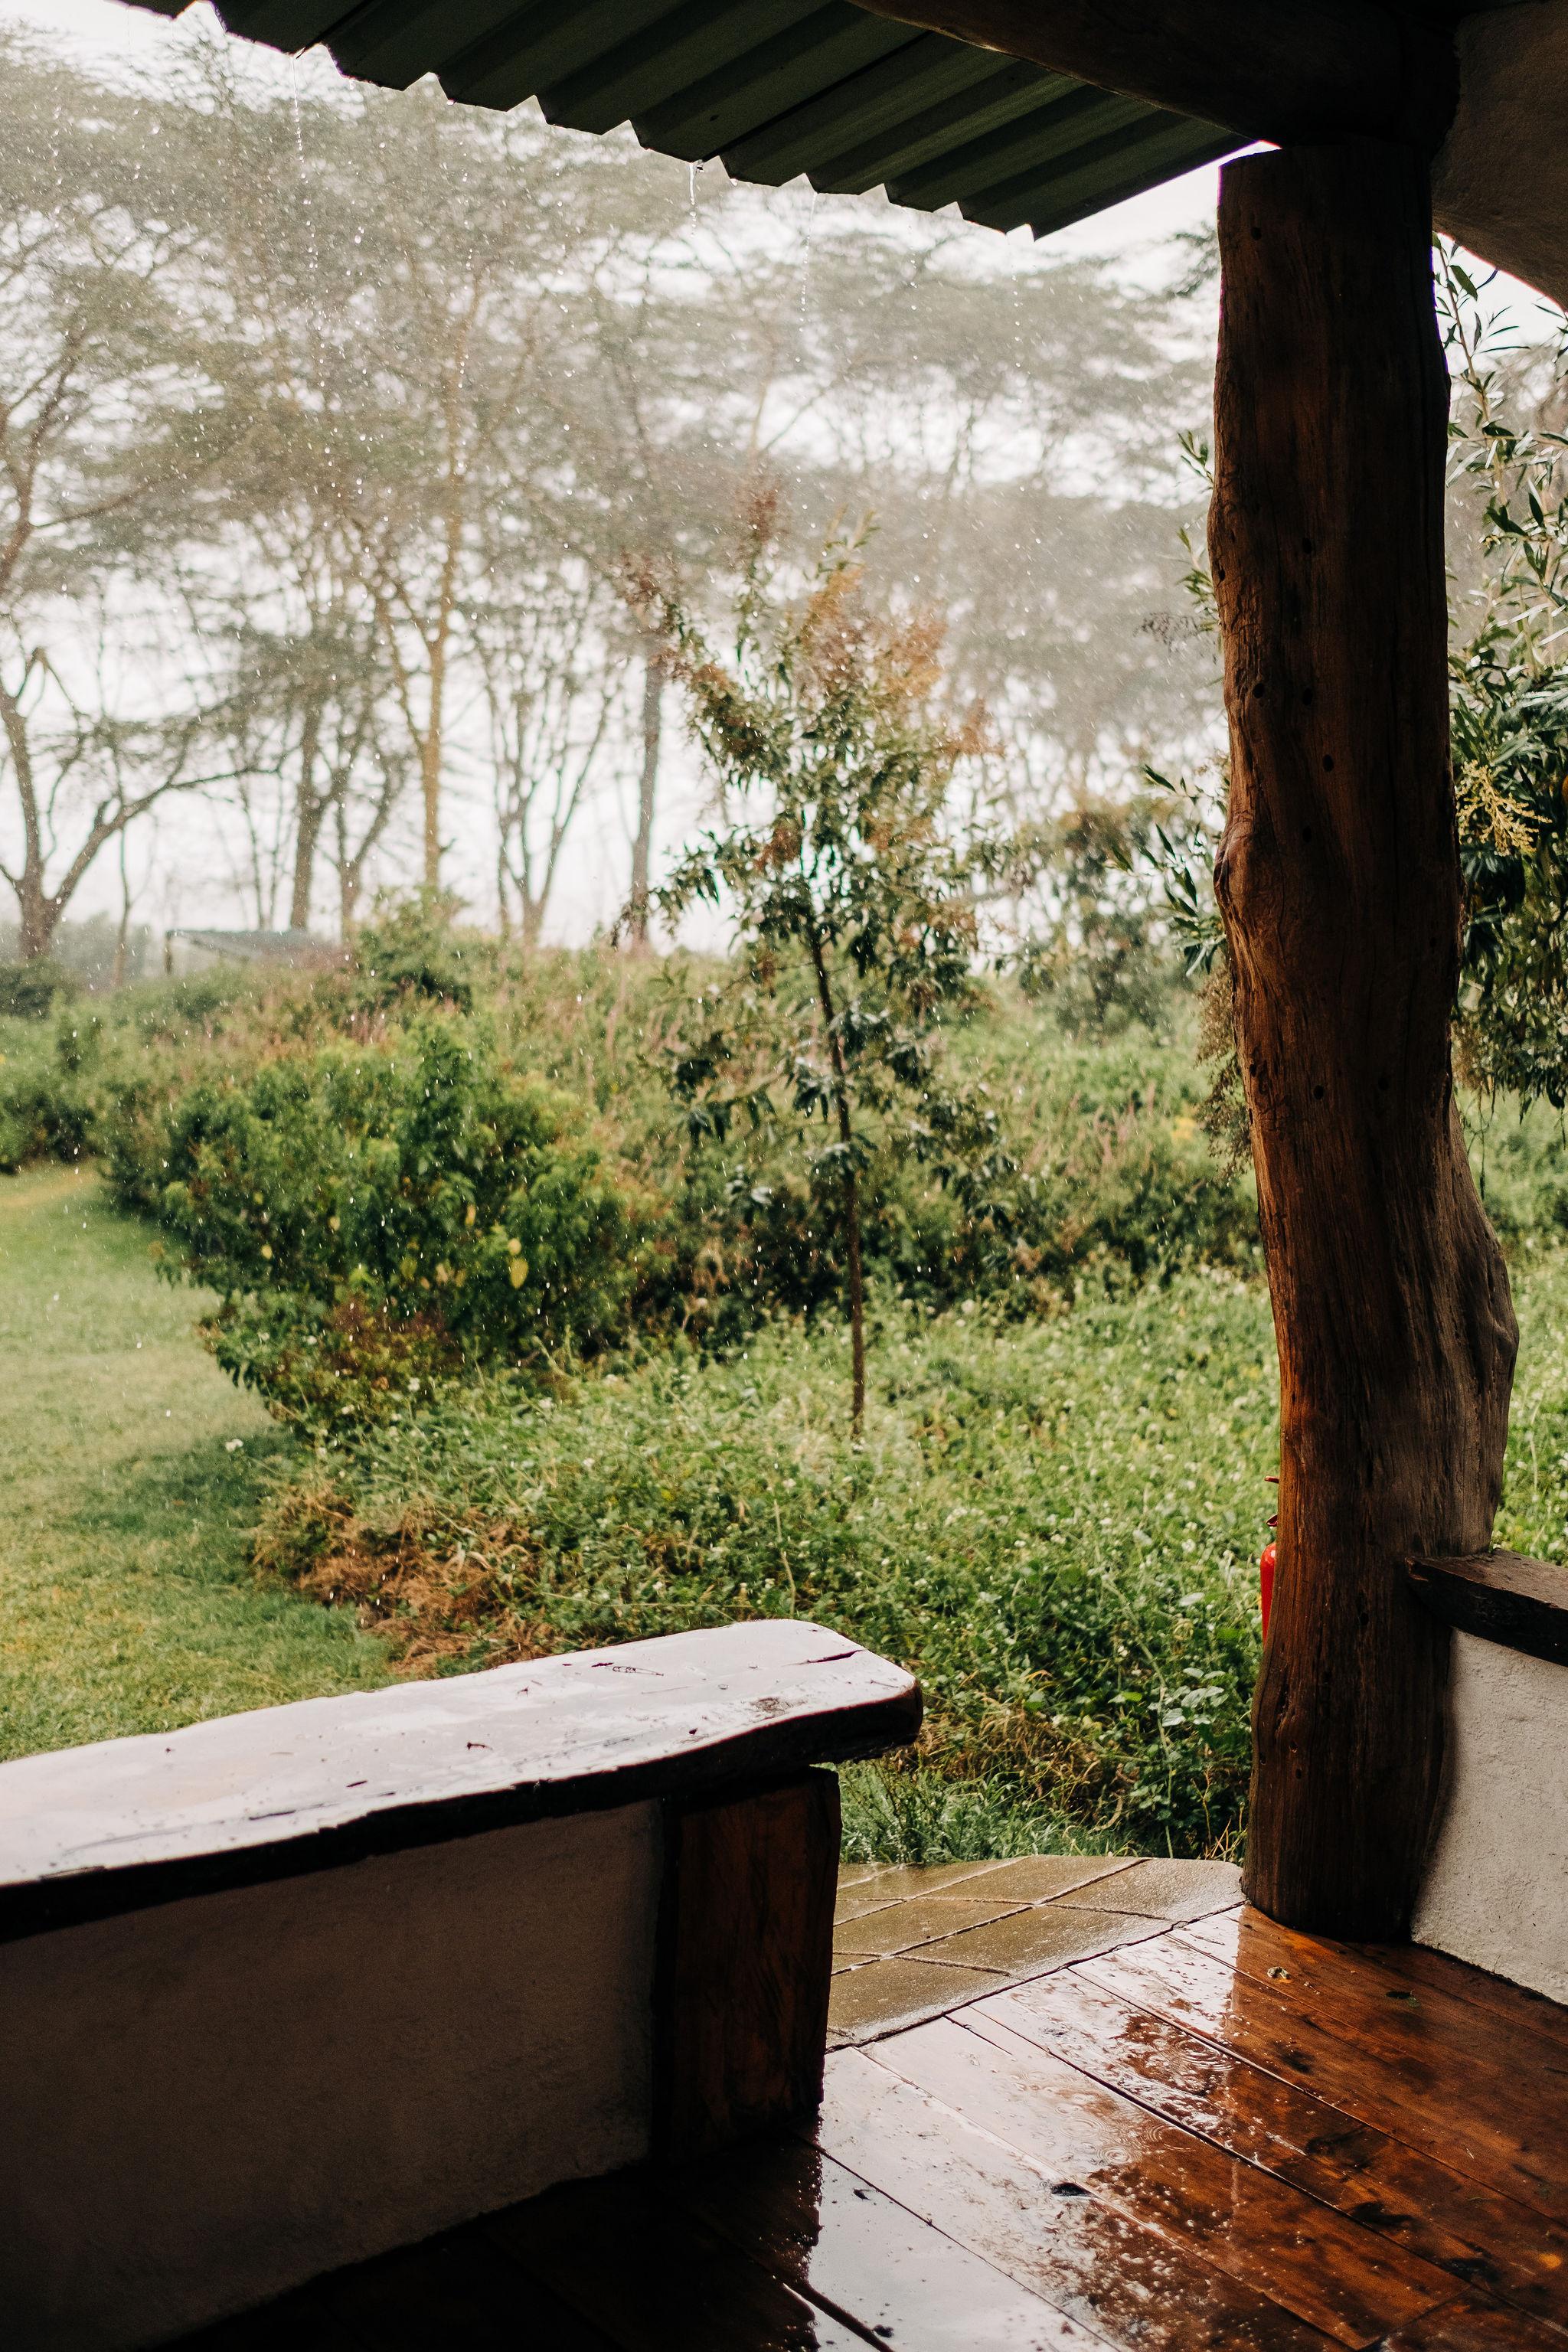 Anna-Hari-Photography-Destination-Wedding-Photographer-Kenya-3.jpg